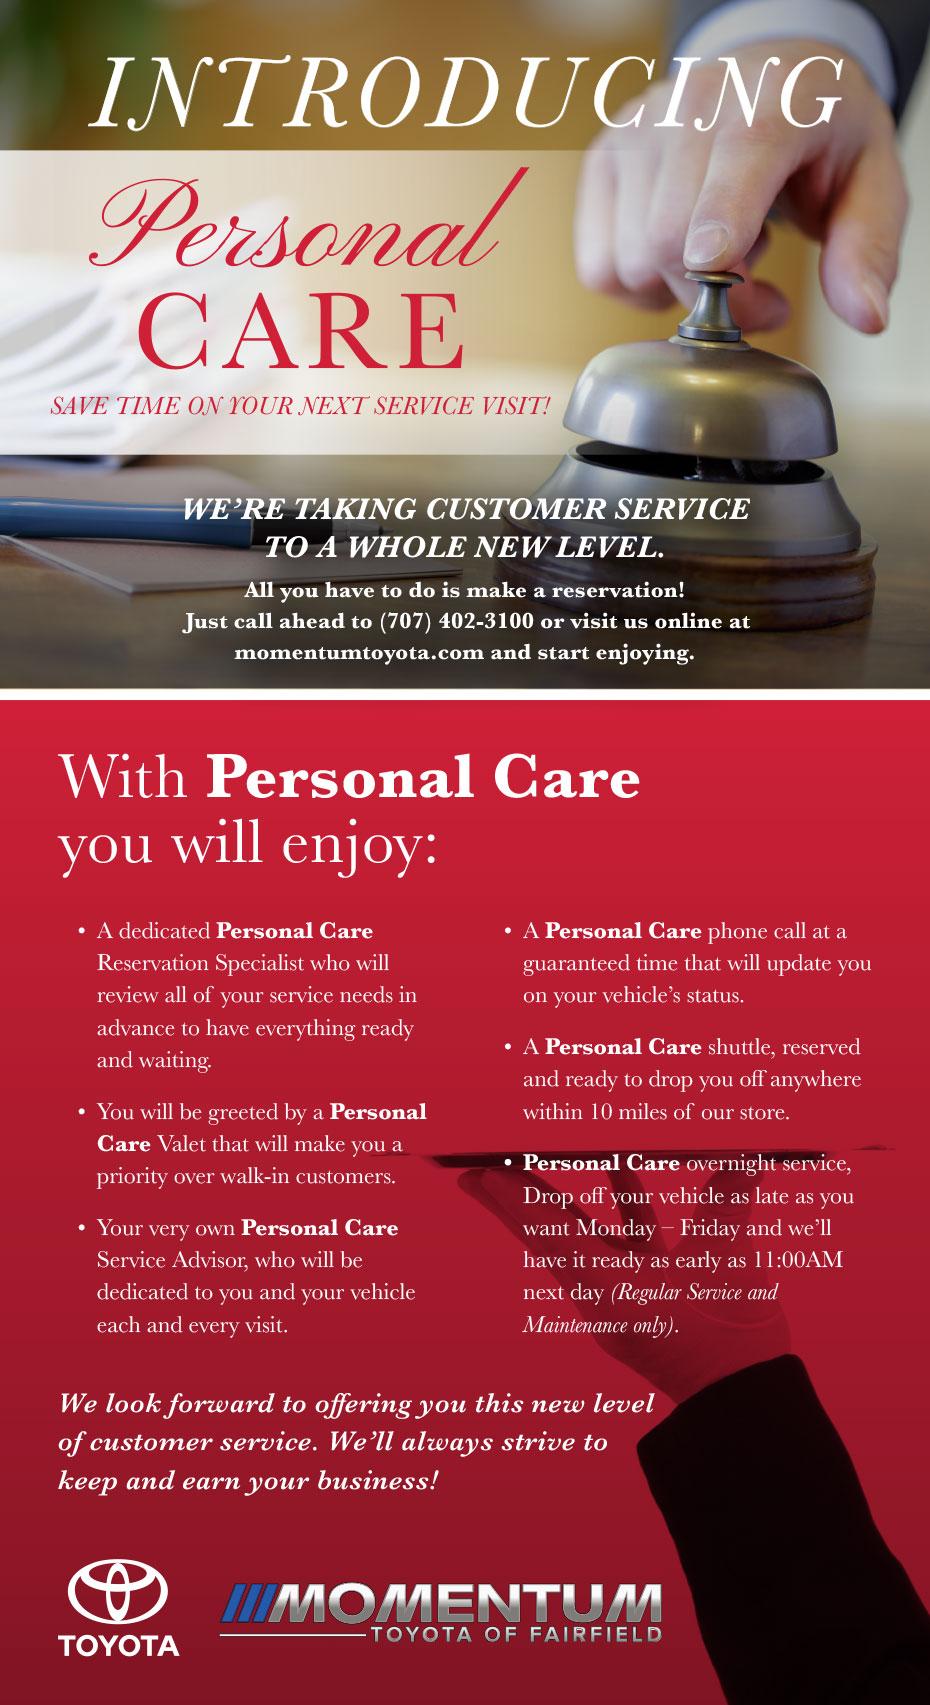 Personal care service momentum toyota dealership